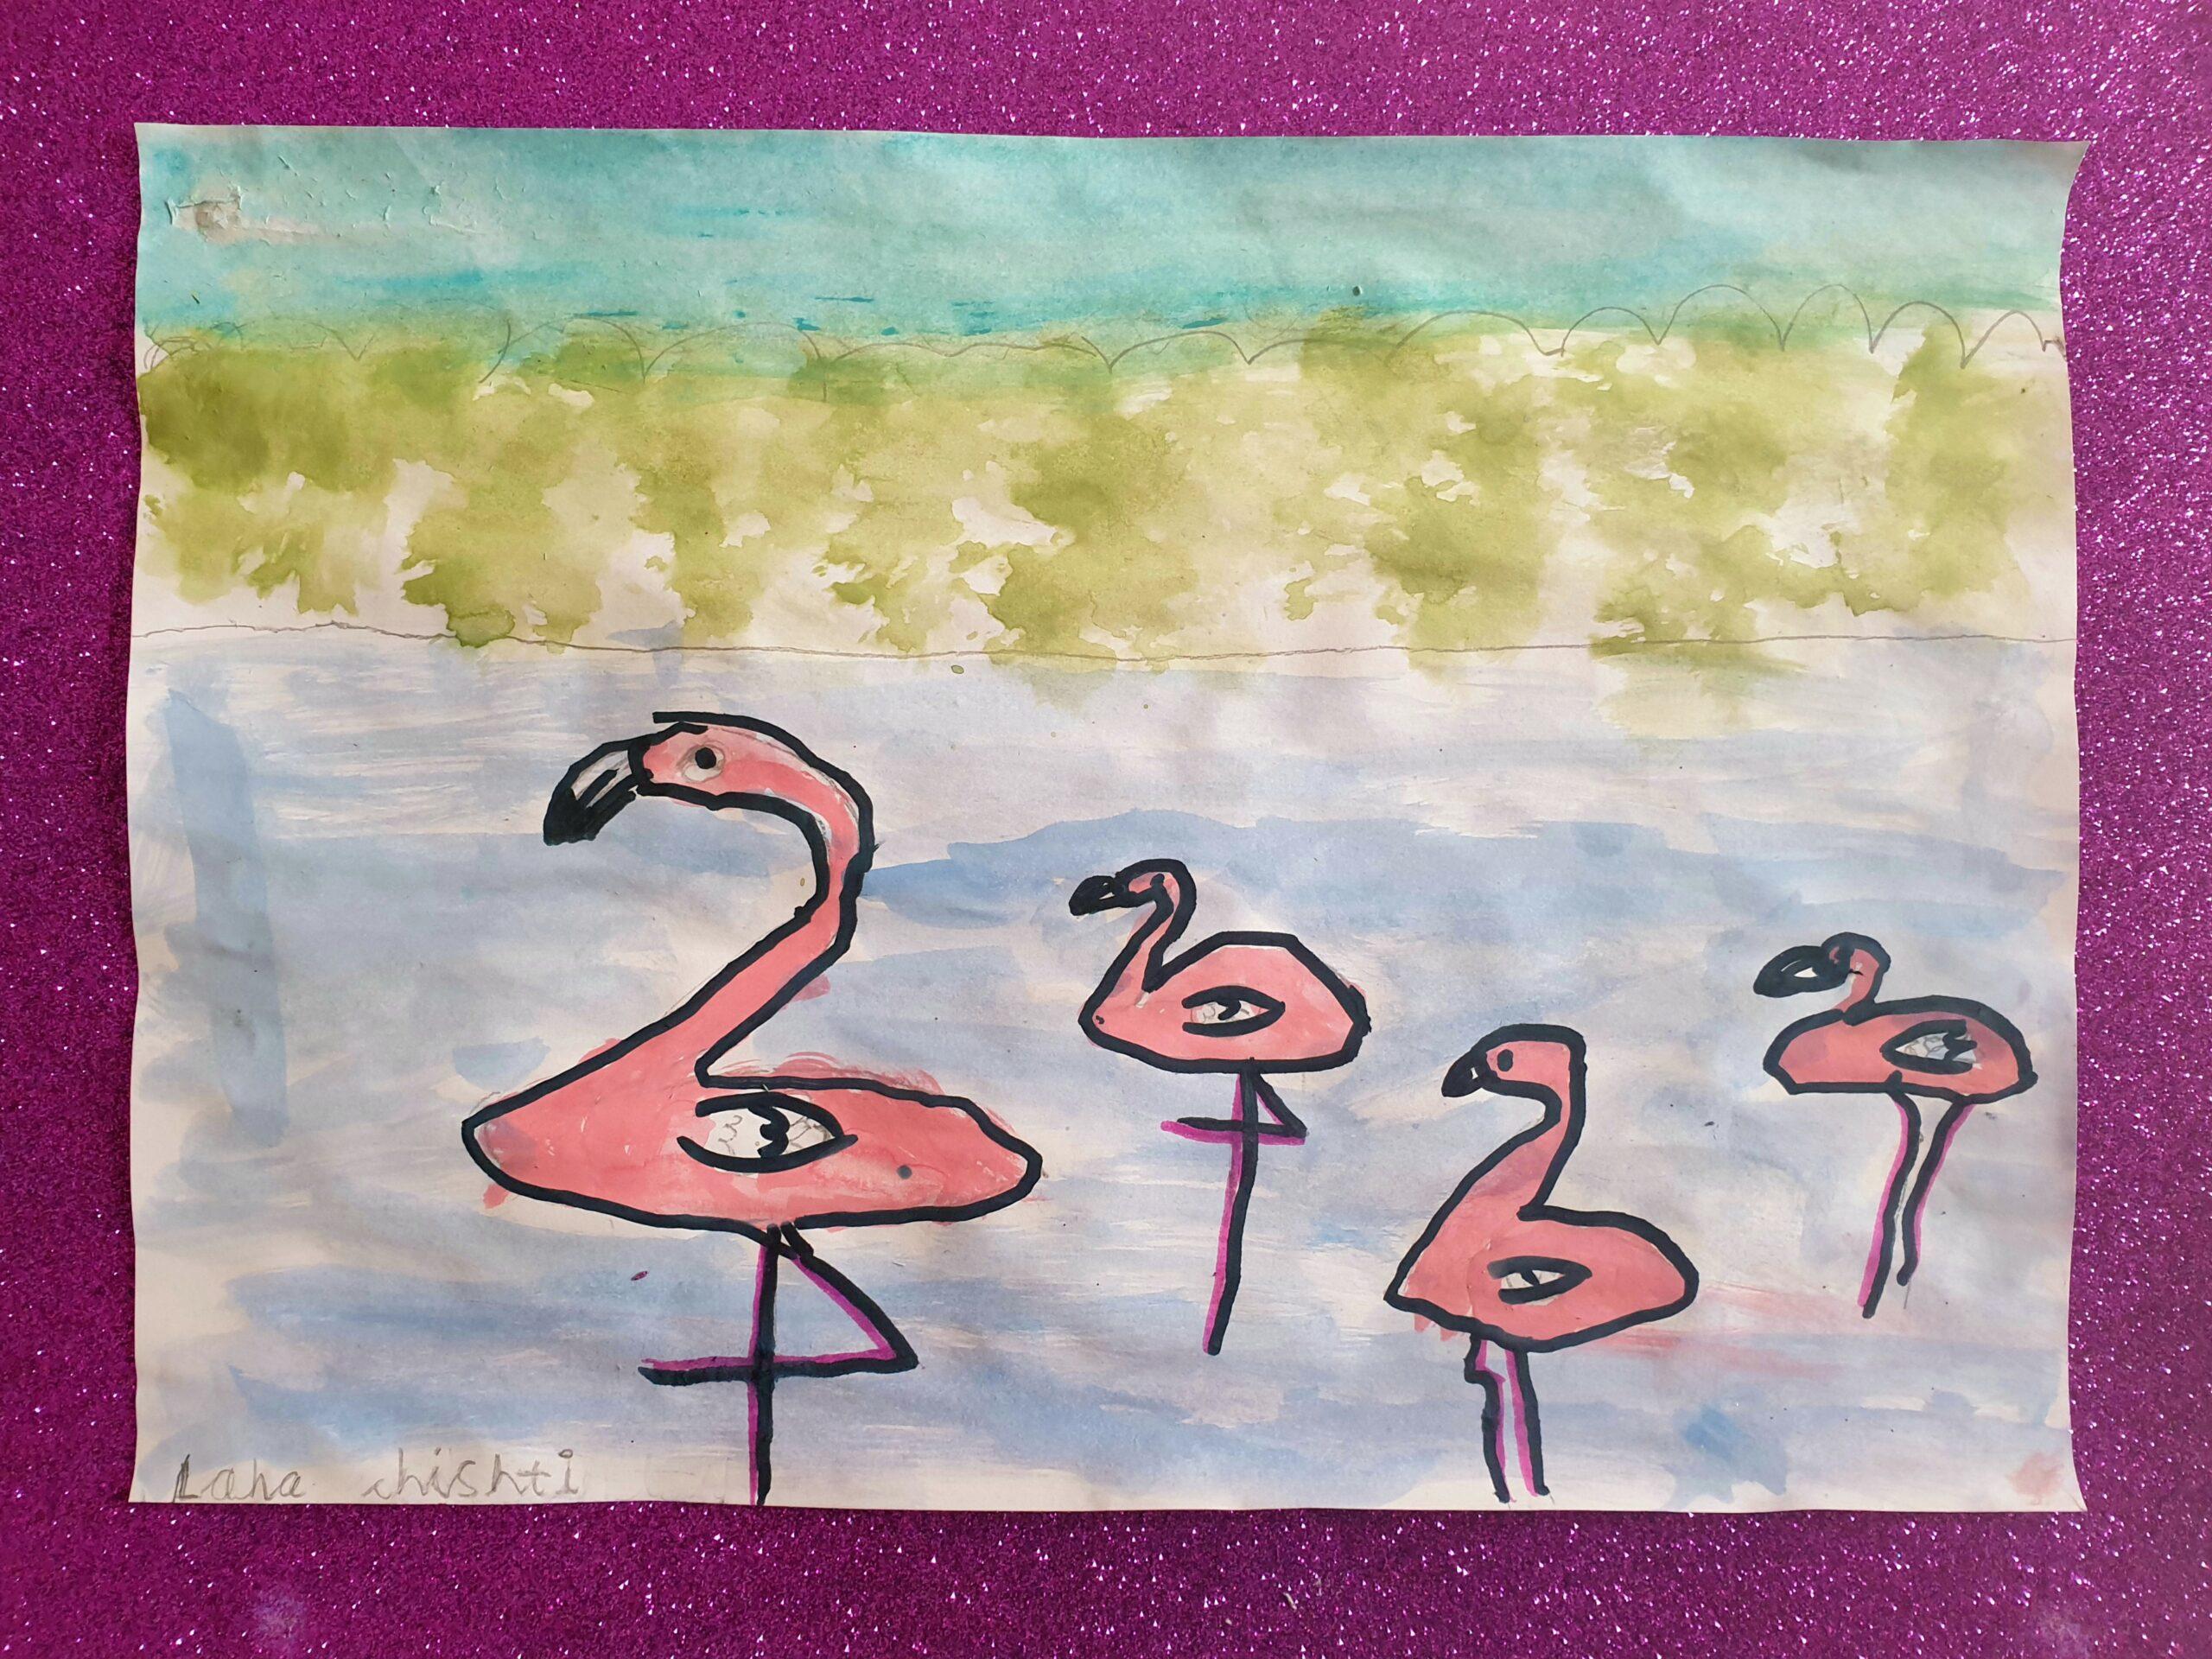 Flamingoes by Lana Chishti